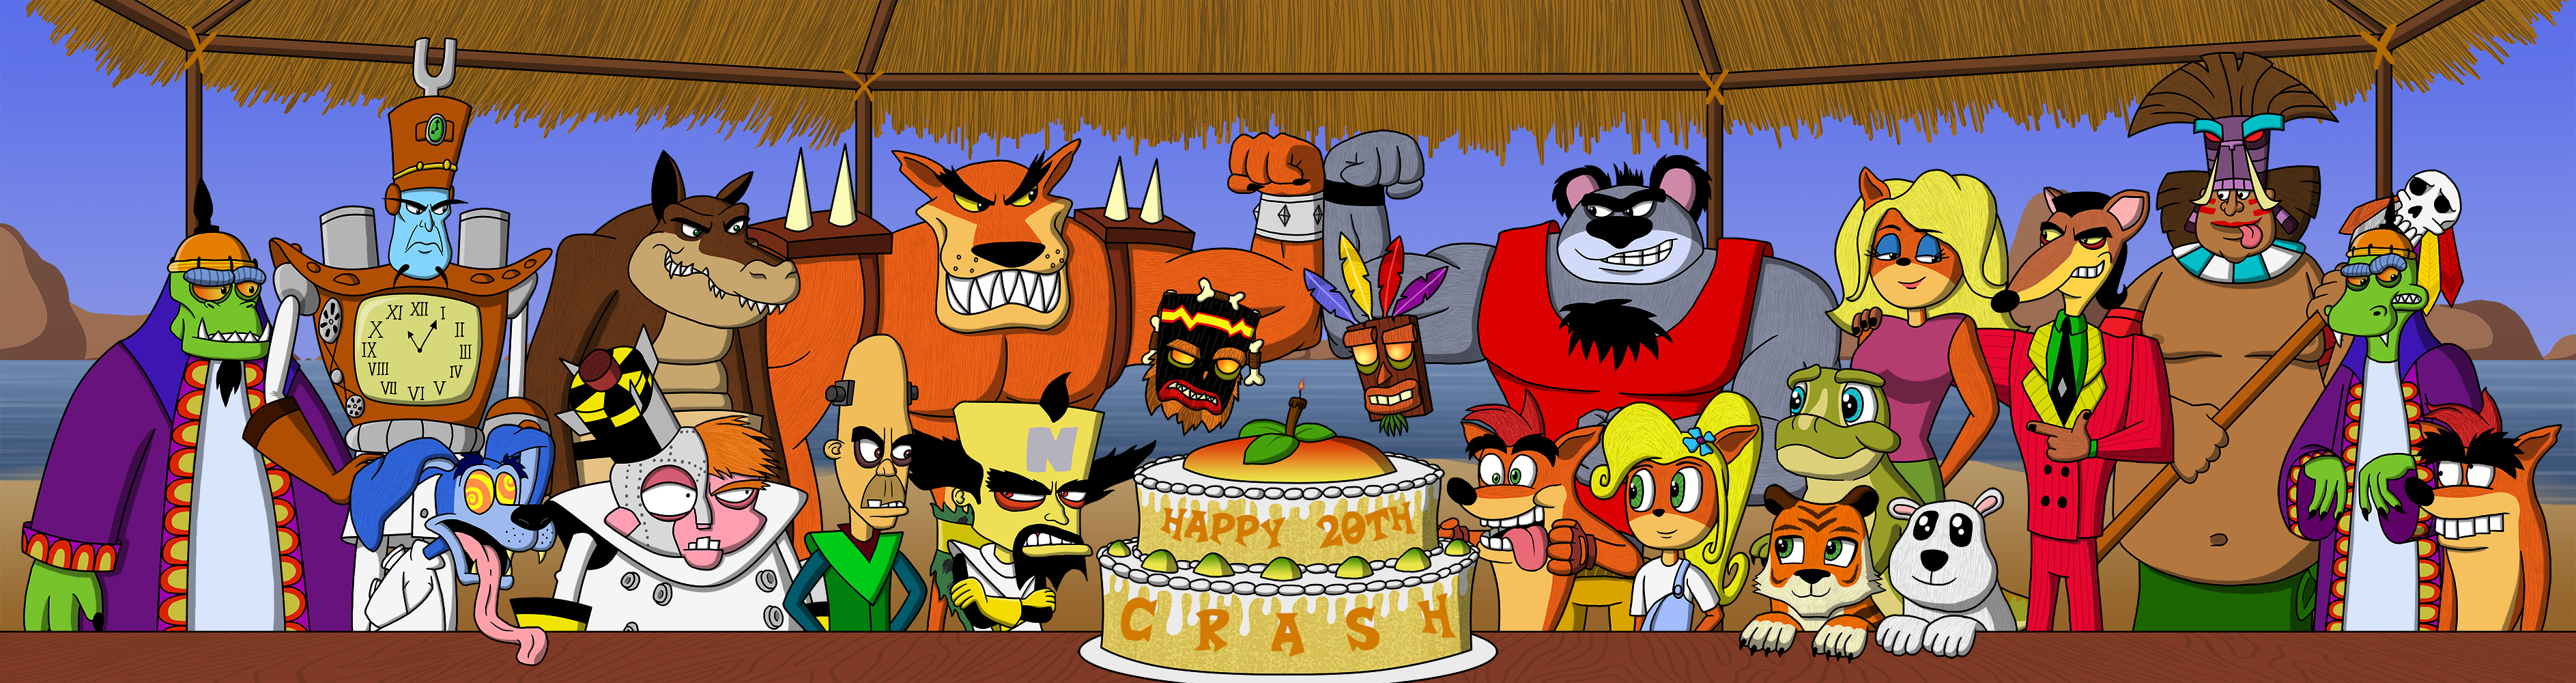 Crash Bandicoot 20th Anniversary Crash Bandicoot Know Your Meme